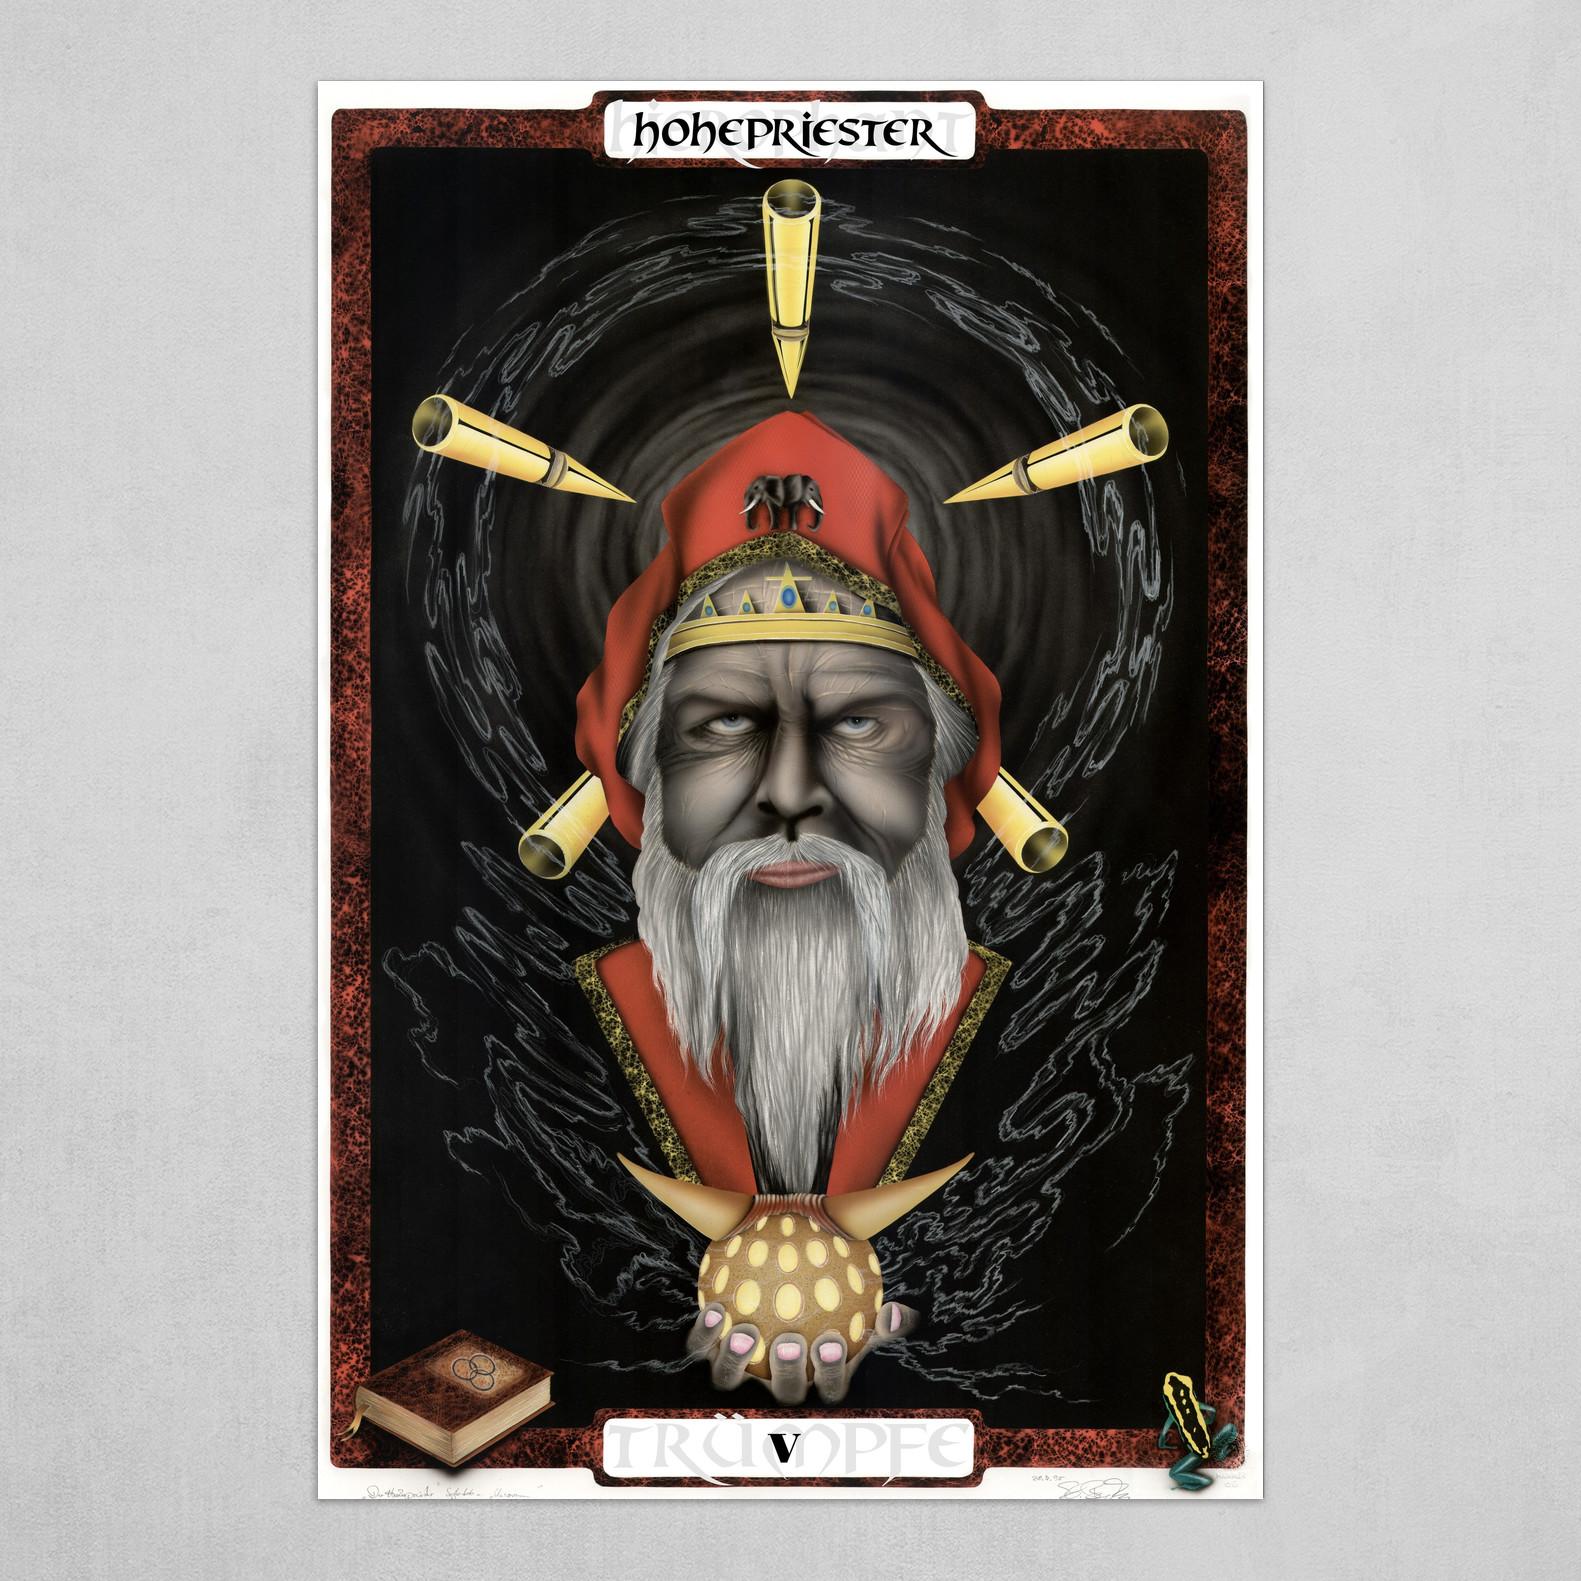 Der Hohepriester - The Hierophant